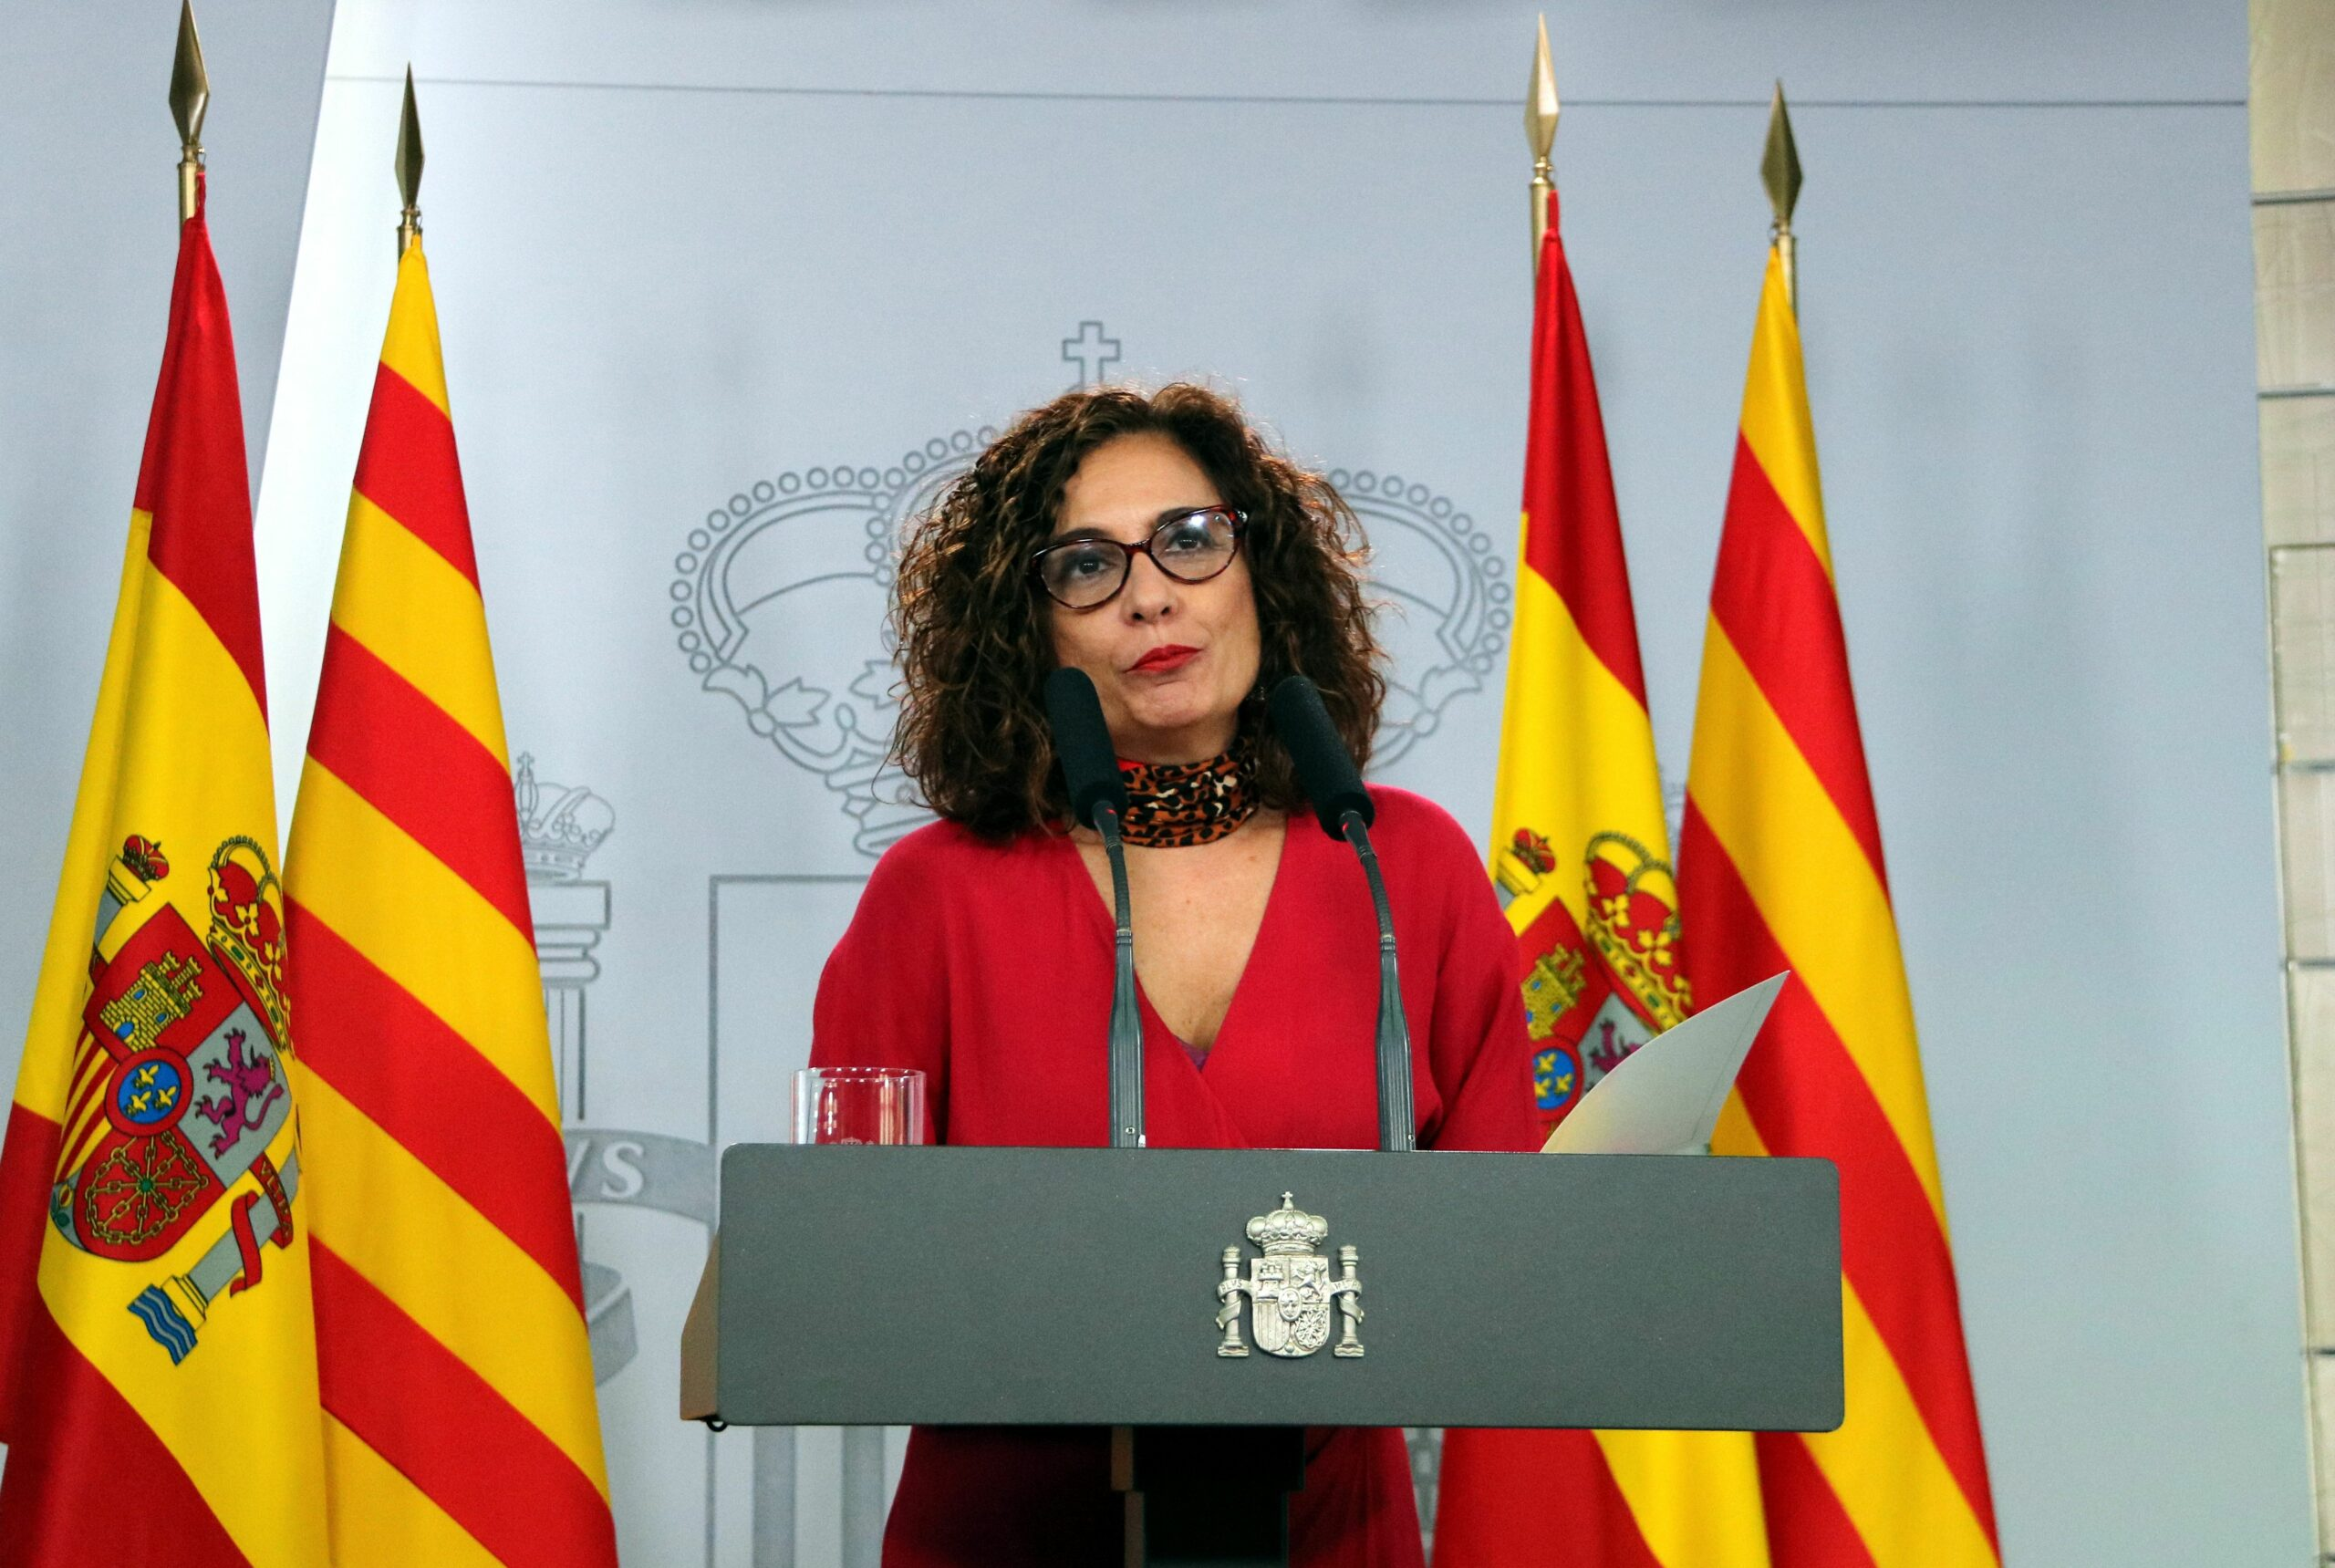 La ministra portaveu del govern espanyol, Maria Jesús Montero | ACN